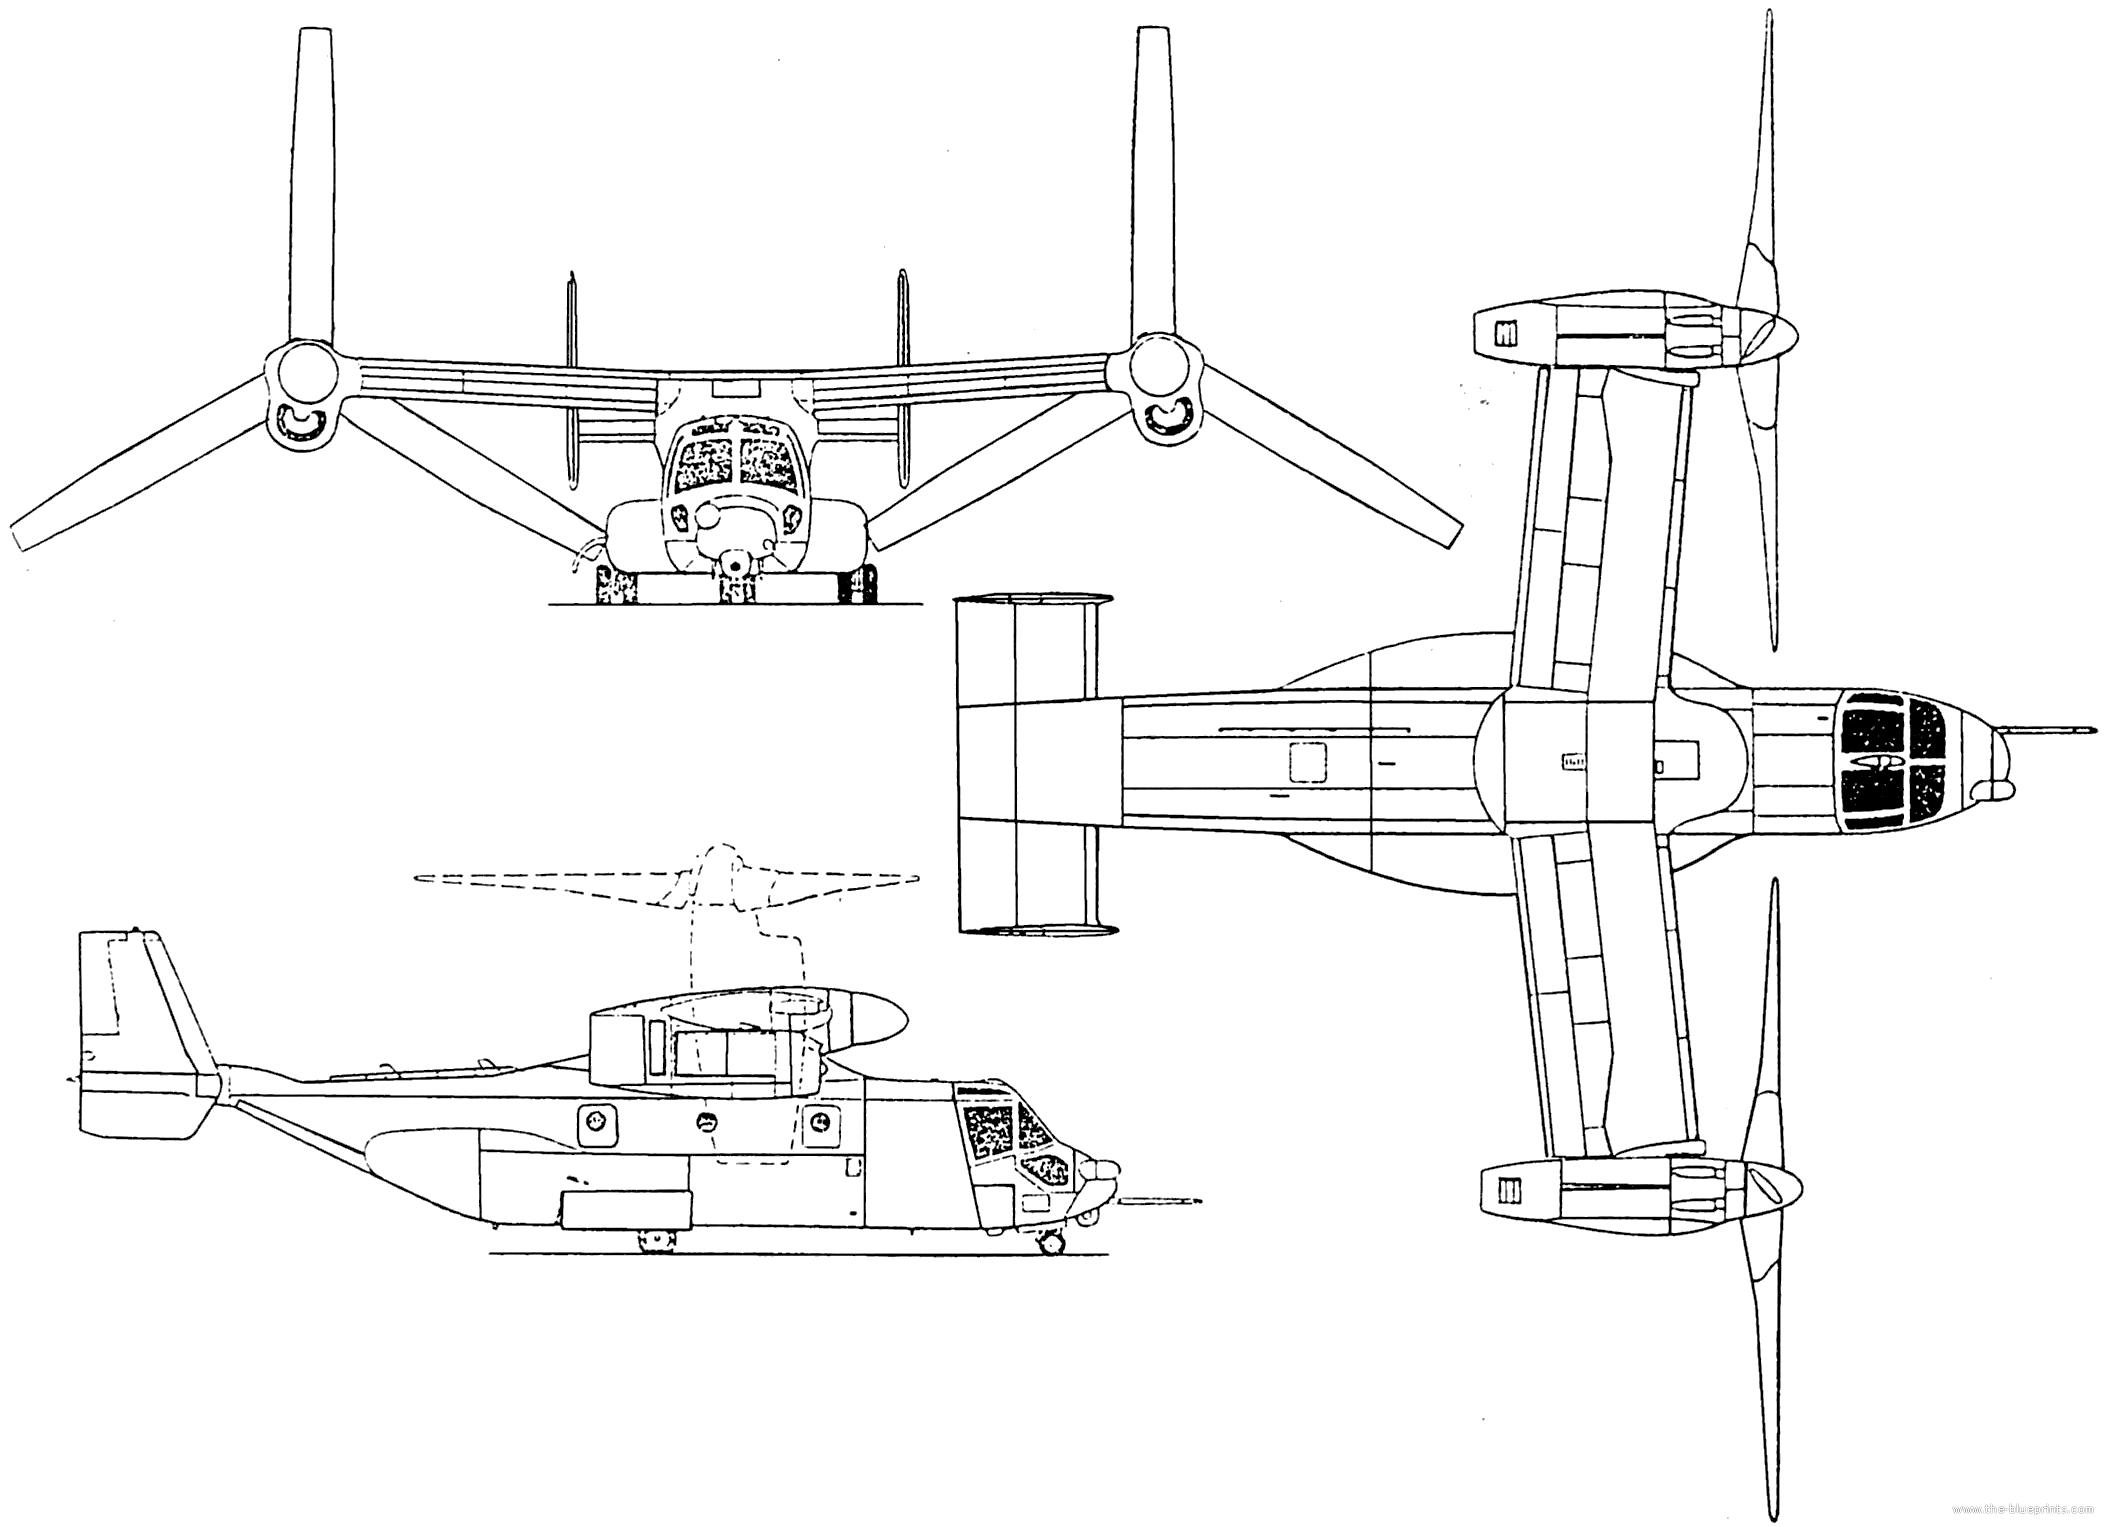 Blueprints Gt Helicopters Gt Bell Gt Bell Boeing V 22 Osprey